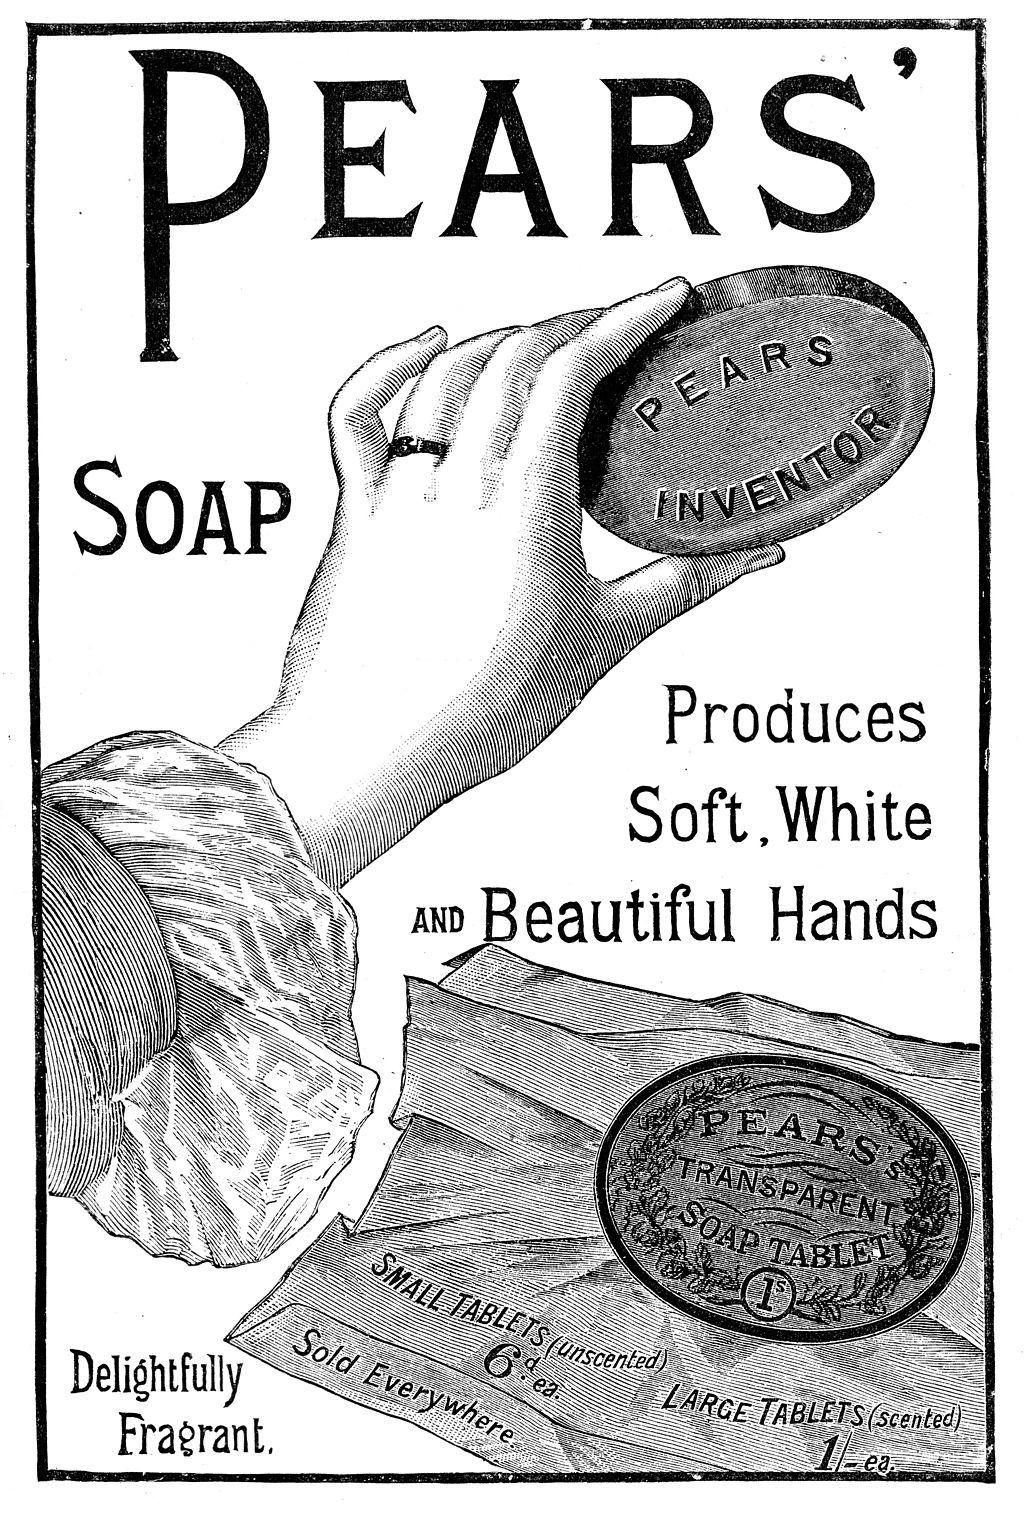 Pears' Soap advertisement 1886 - Pears (soap) - Wikipedia ...